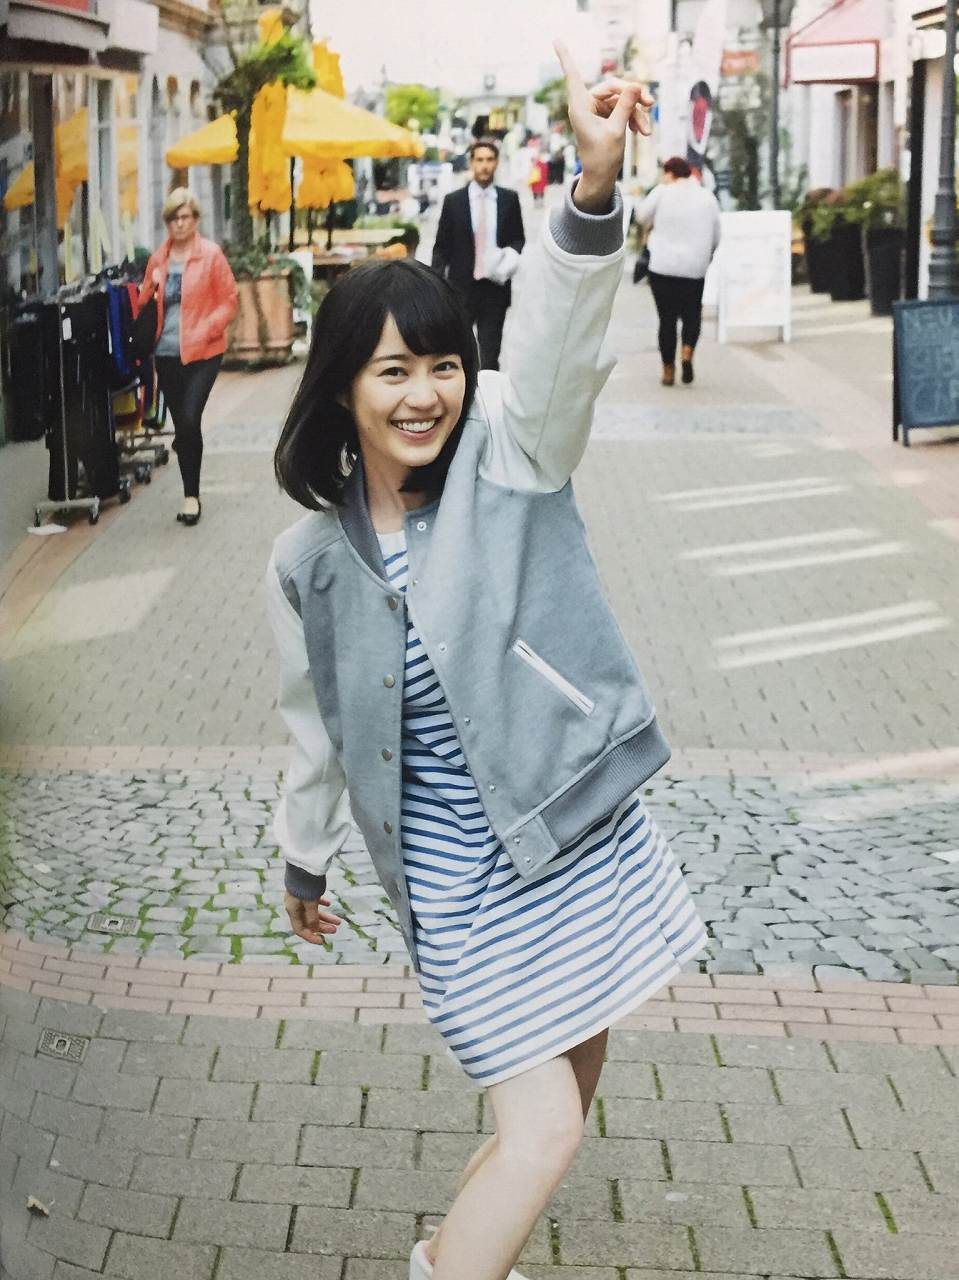 乃木坂46の生田絵梨花